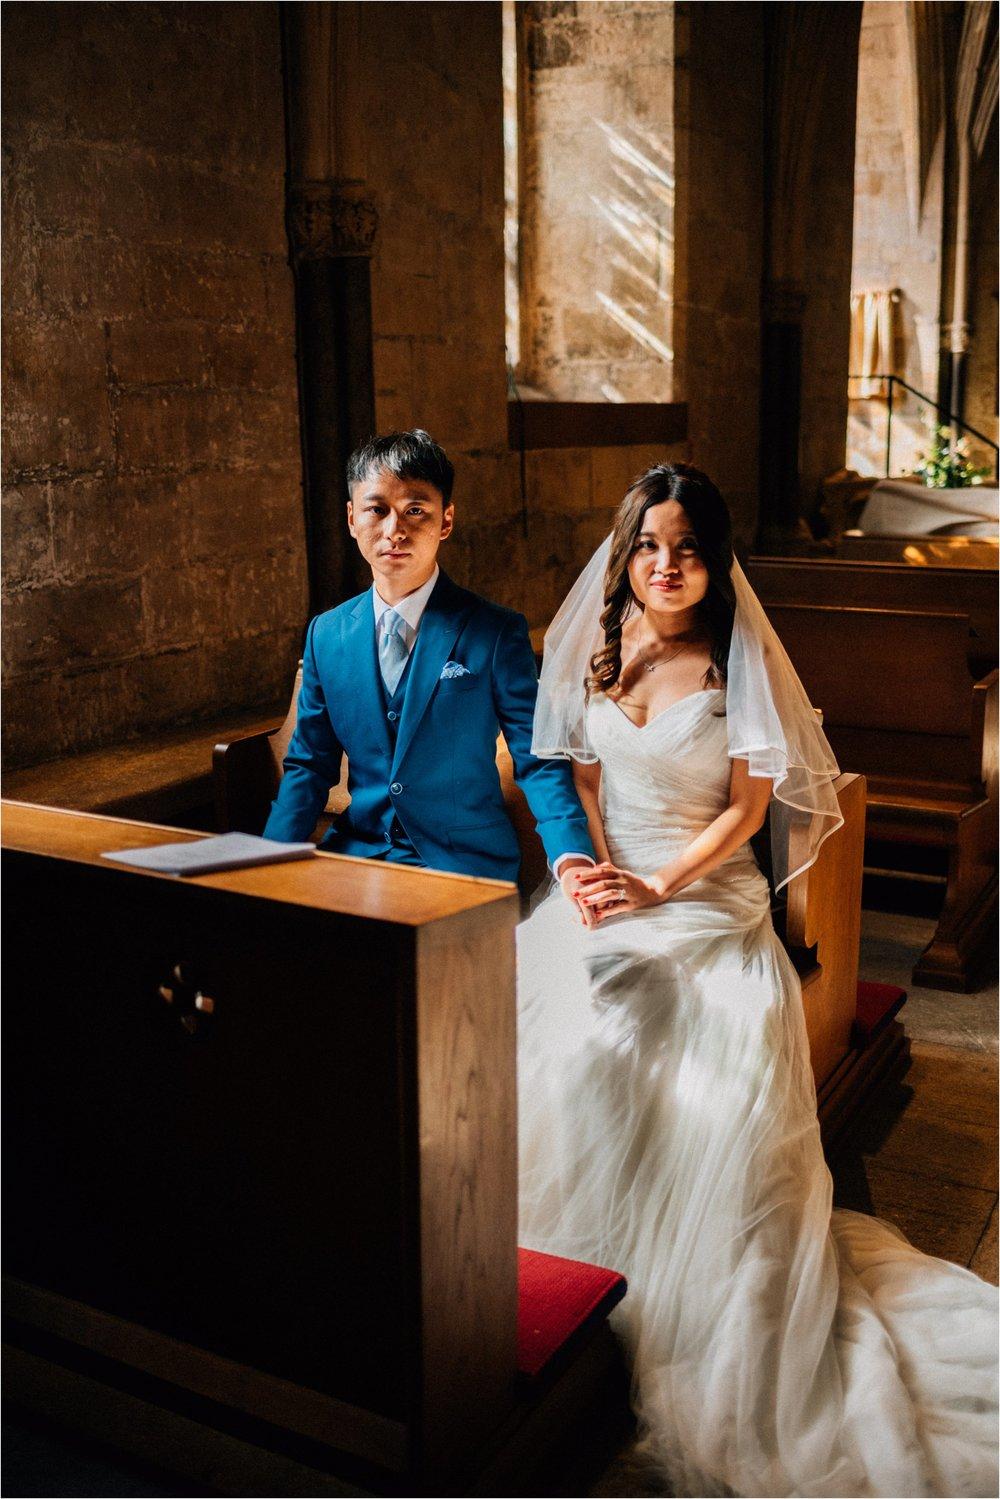 York city elopement wedding photographer_0135.jpg